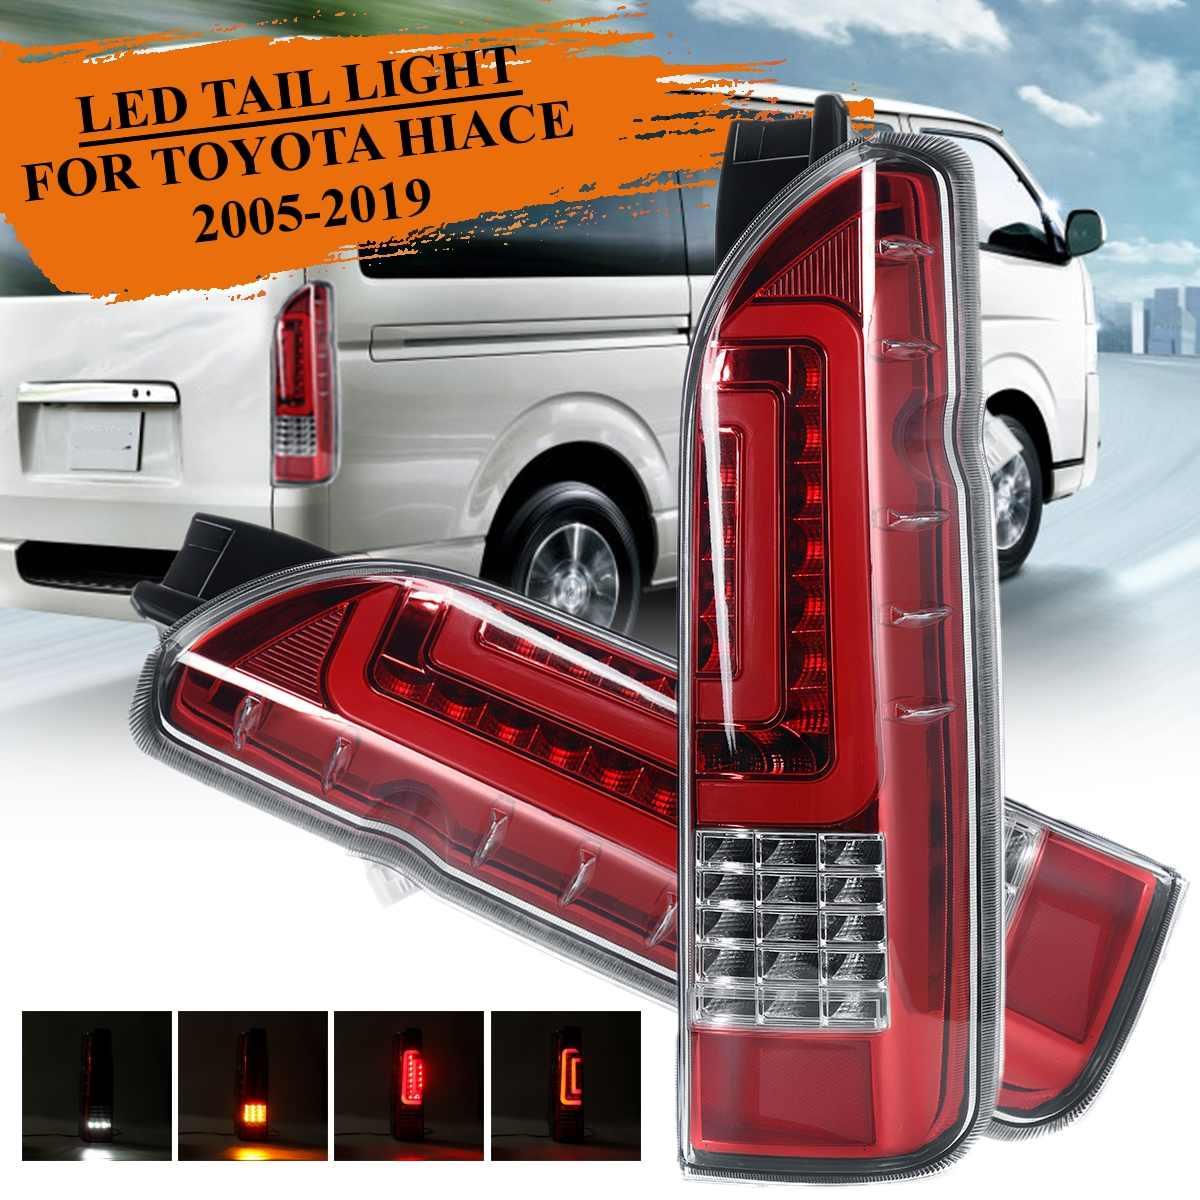 12V Car Led Tail Light FOR TOYOTA HIACE 2005 2019 Taillight Rear Reverse Brake Light Fog Light Lamp Drl Accessories Styling